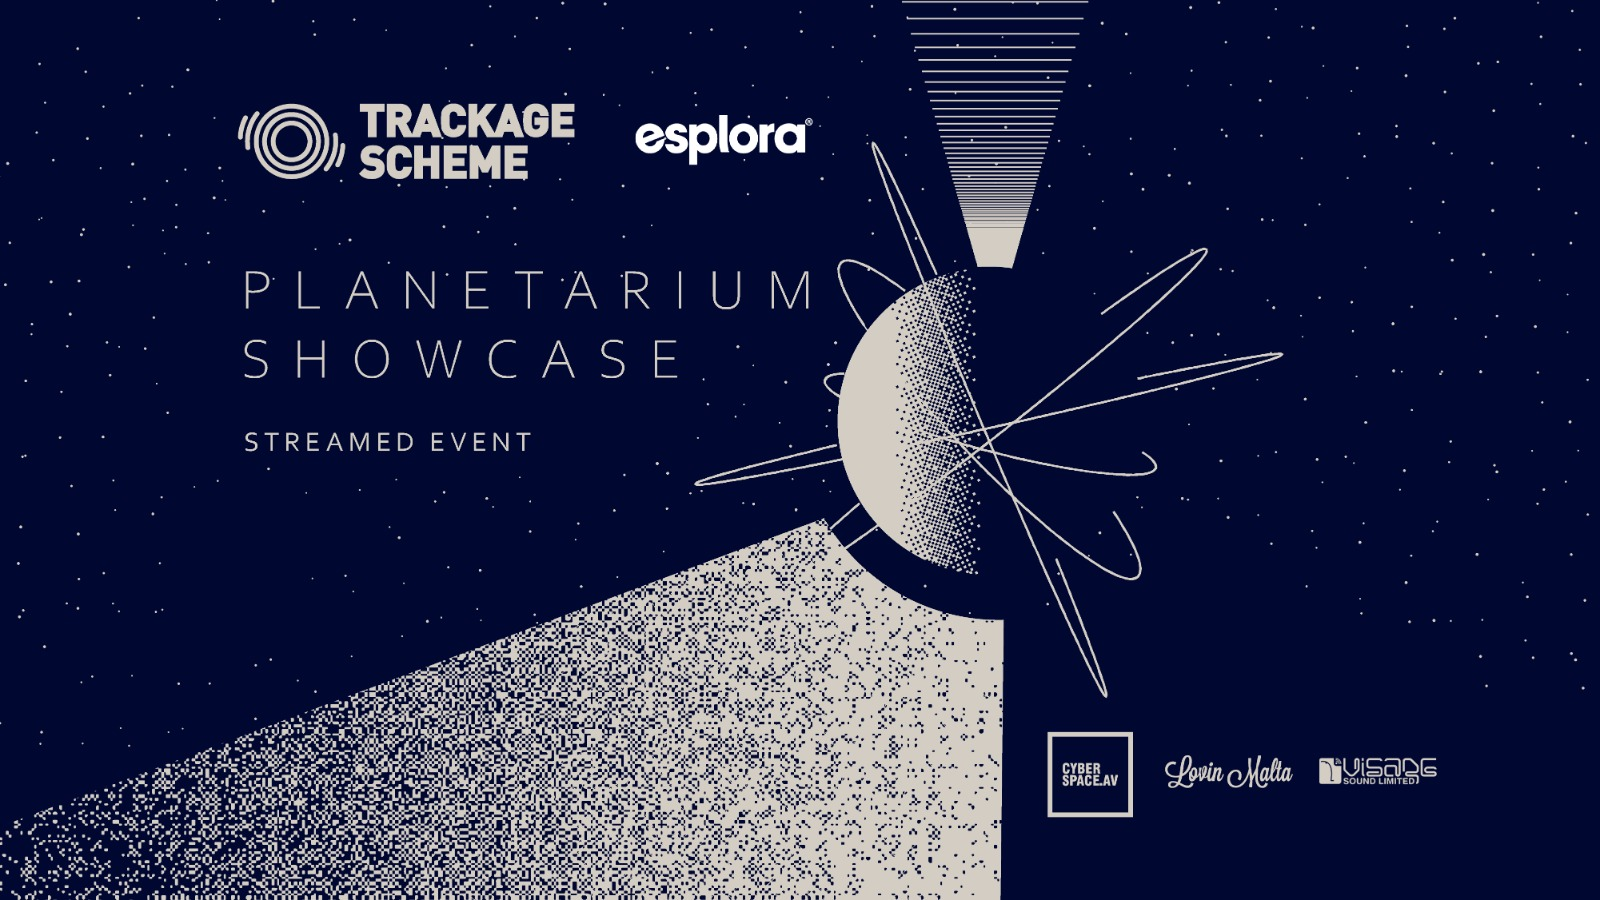 Trackage Scheme x Esplora pres. 'Planetarium Showcase'